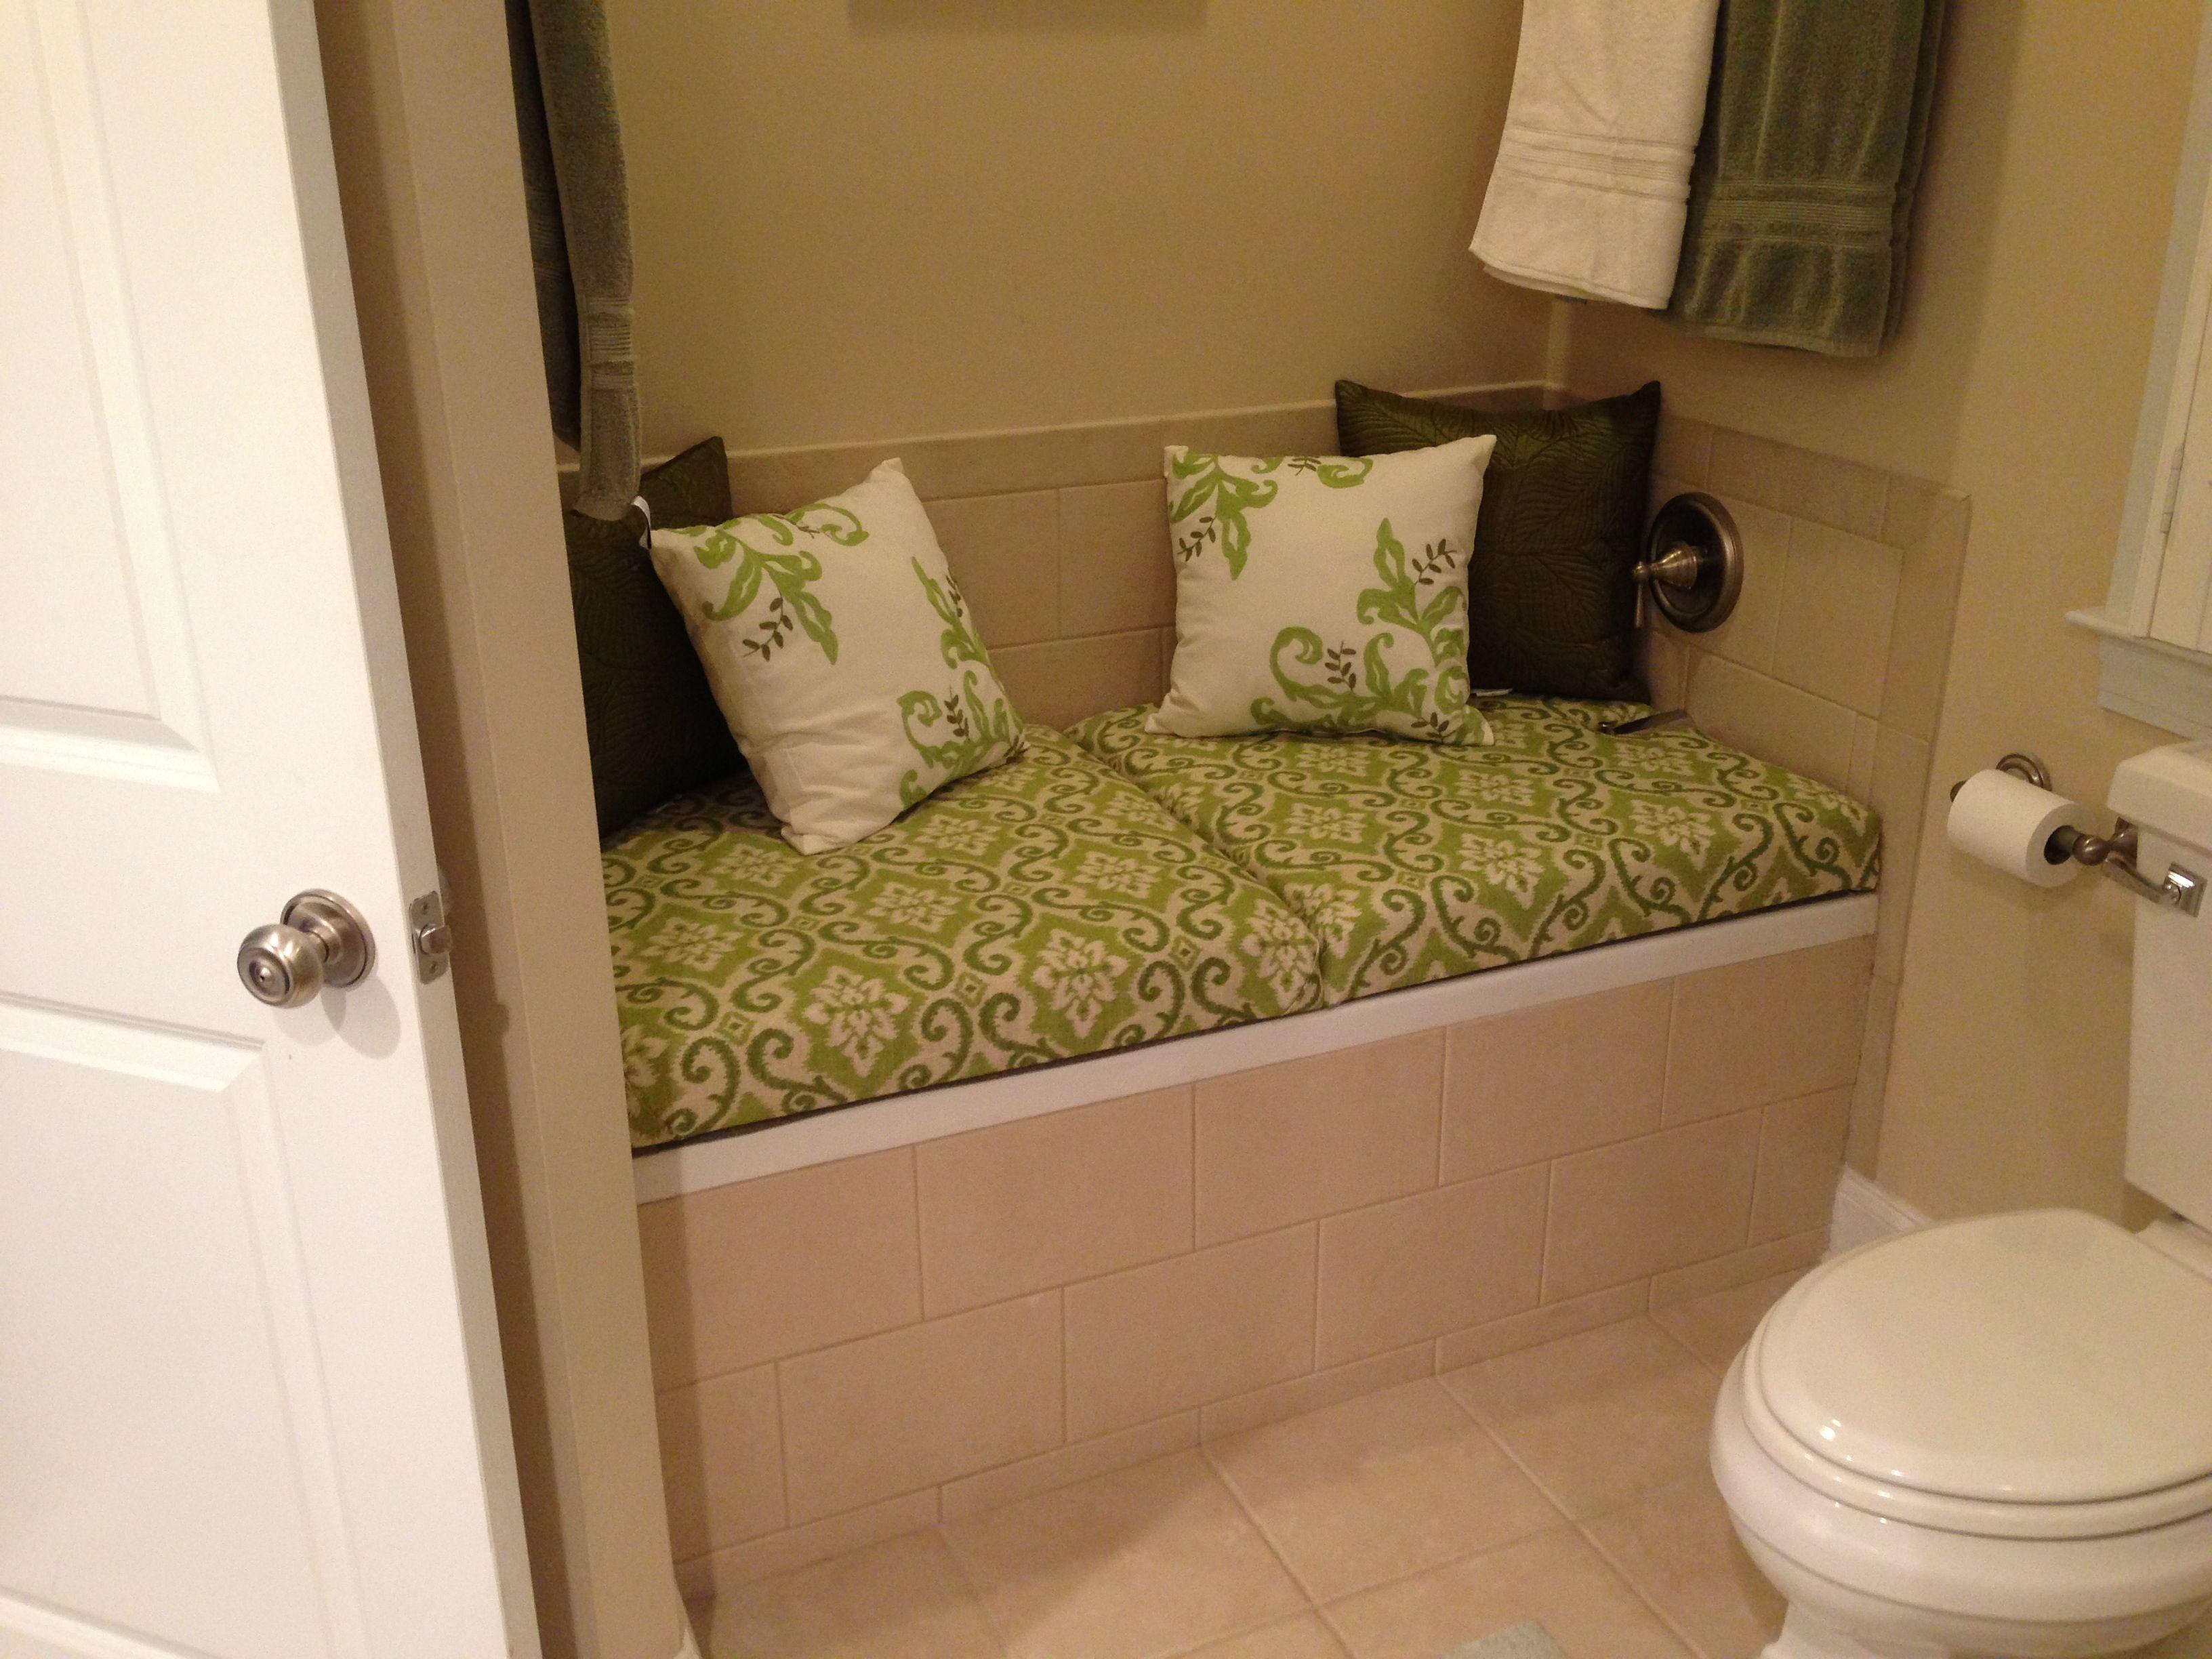 Pin by mandy joy sellick on new home pinterest for Unused bathtub ideas